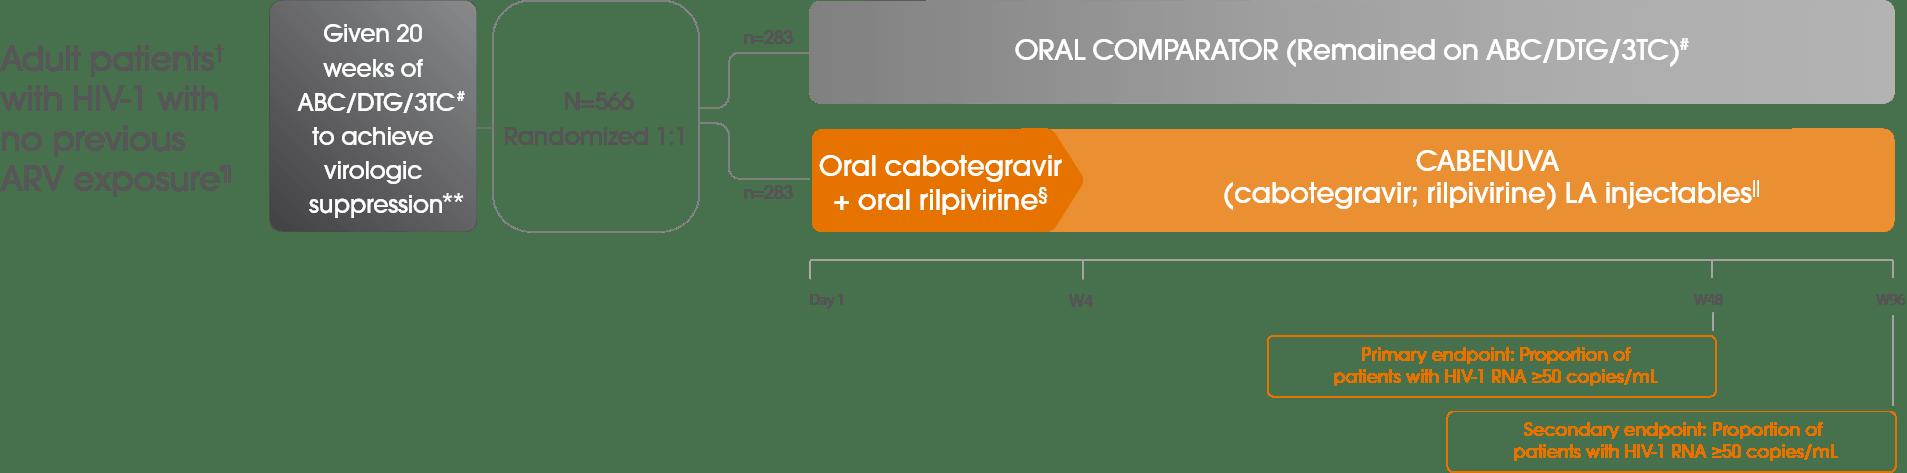 FLAIR TRIAL DESIGN1-3